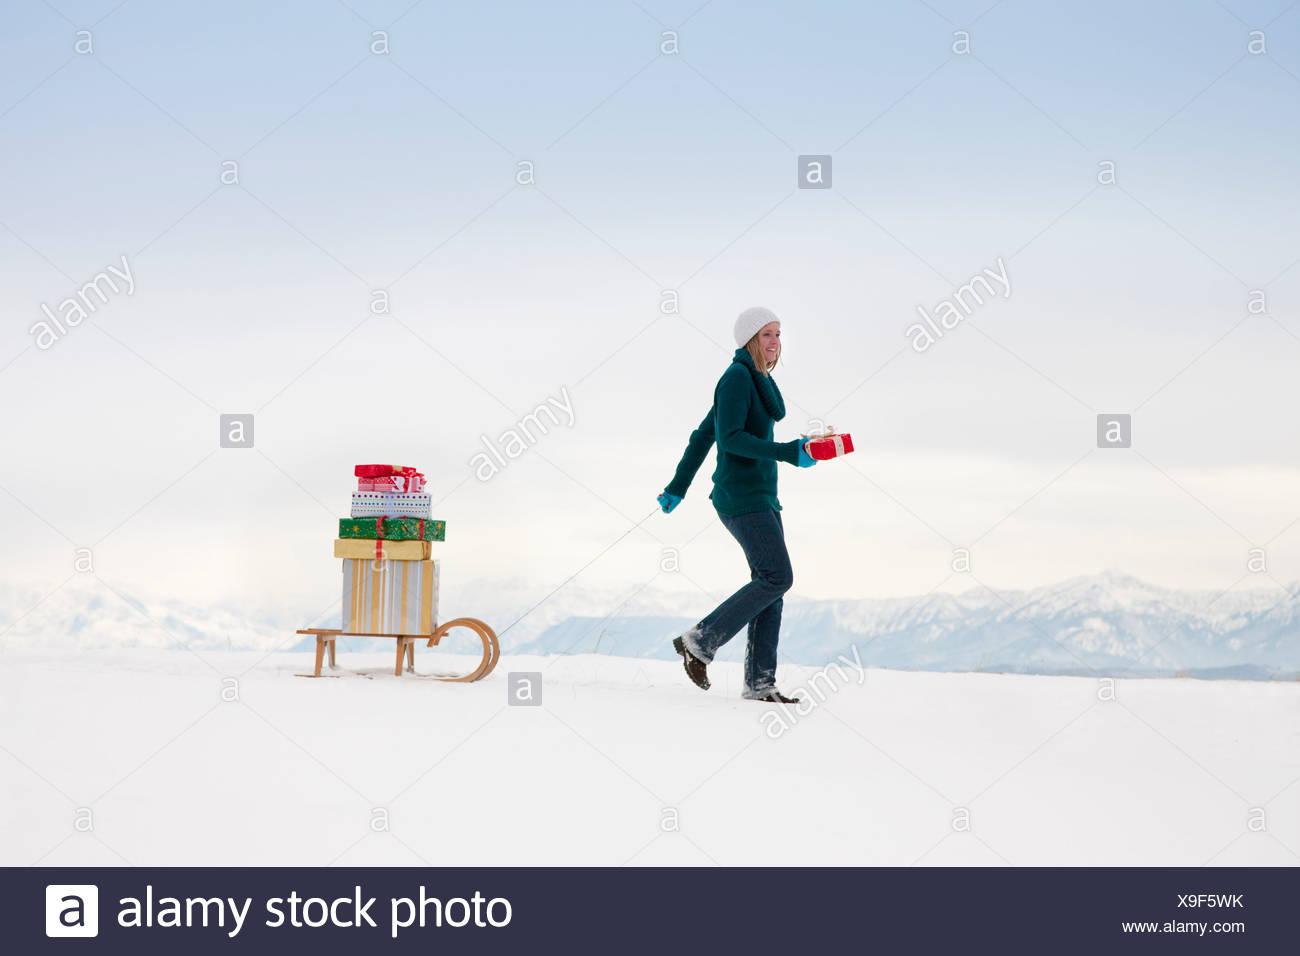 Woman pulls Christmas presents on sled - Stock Image